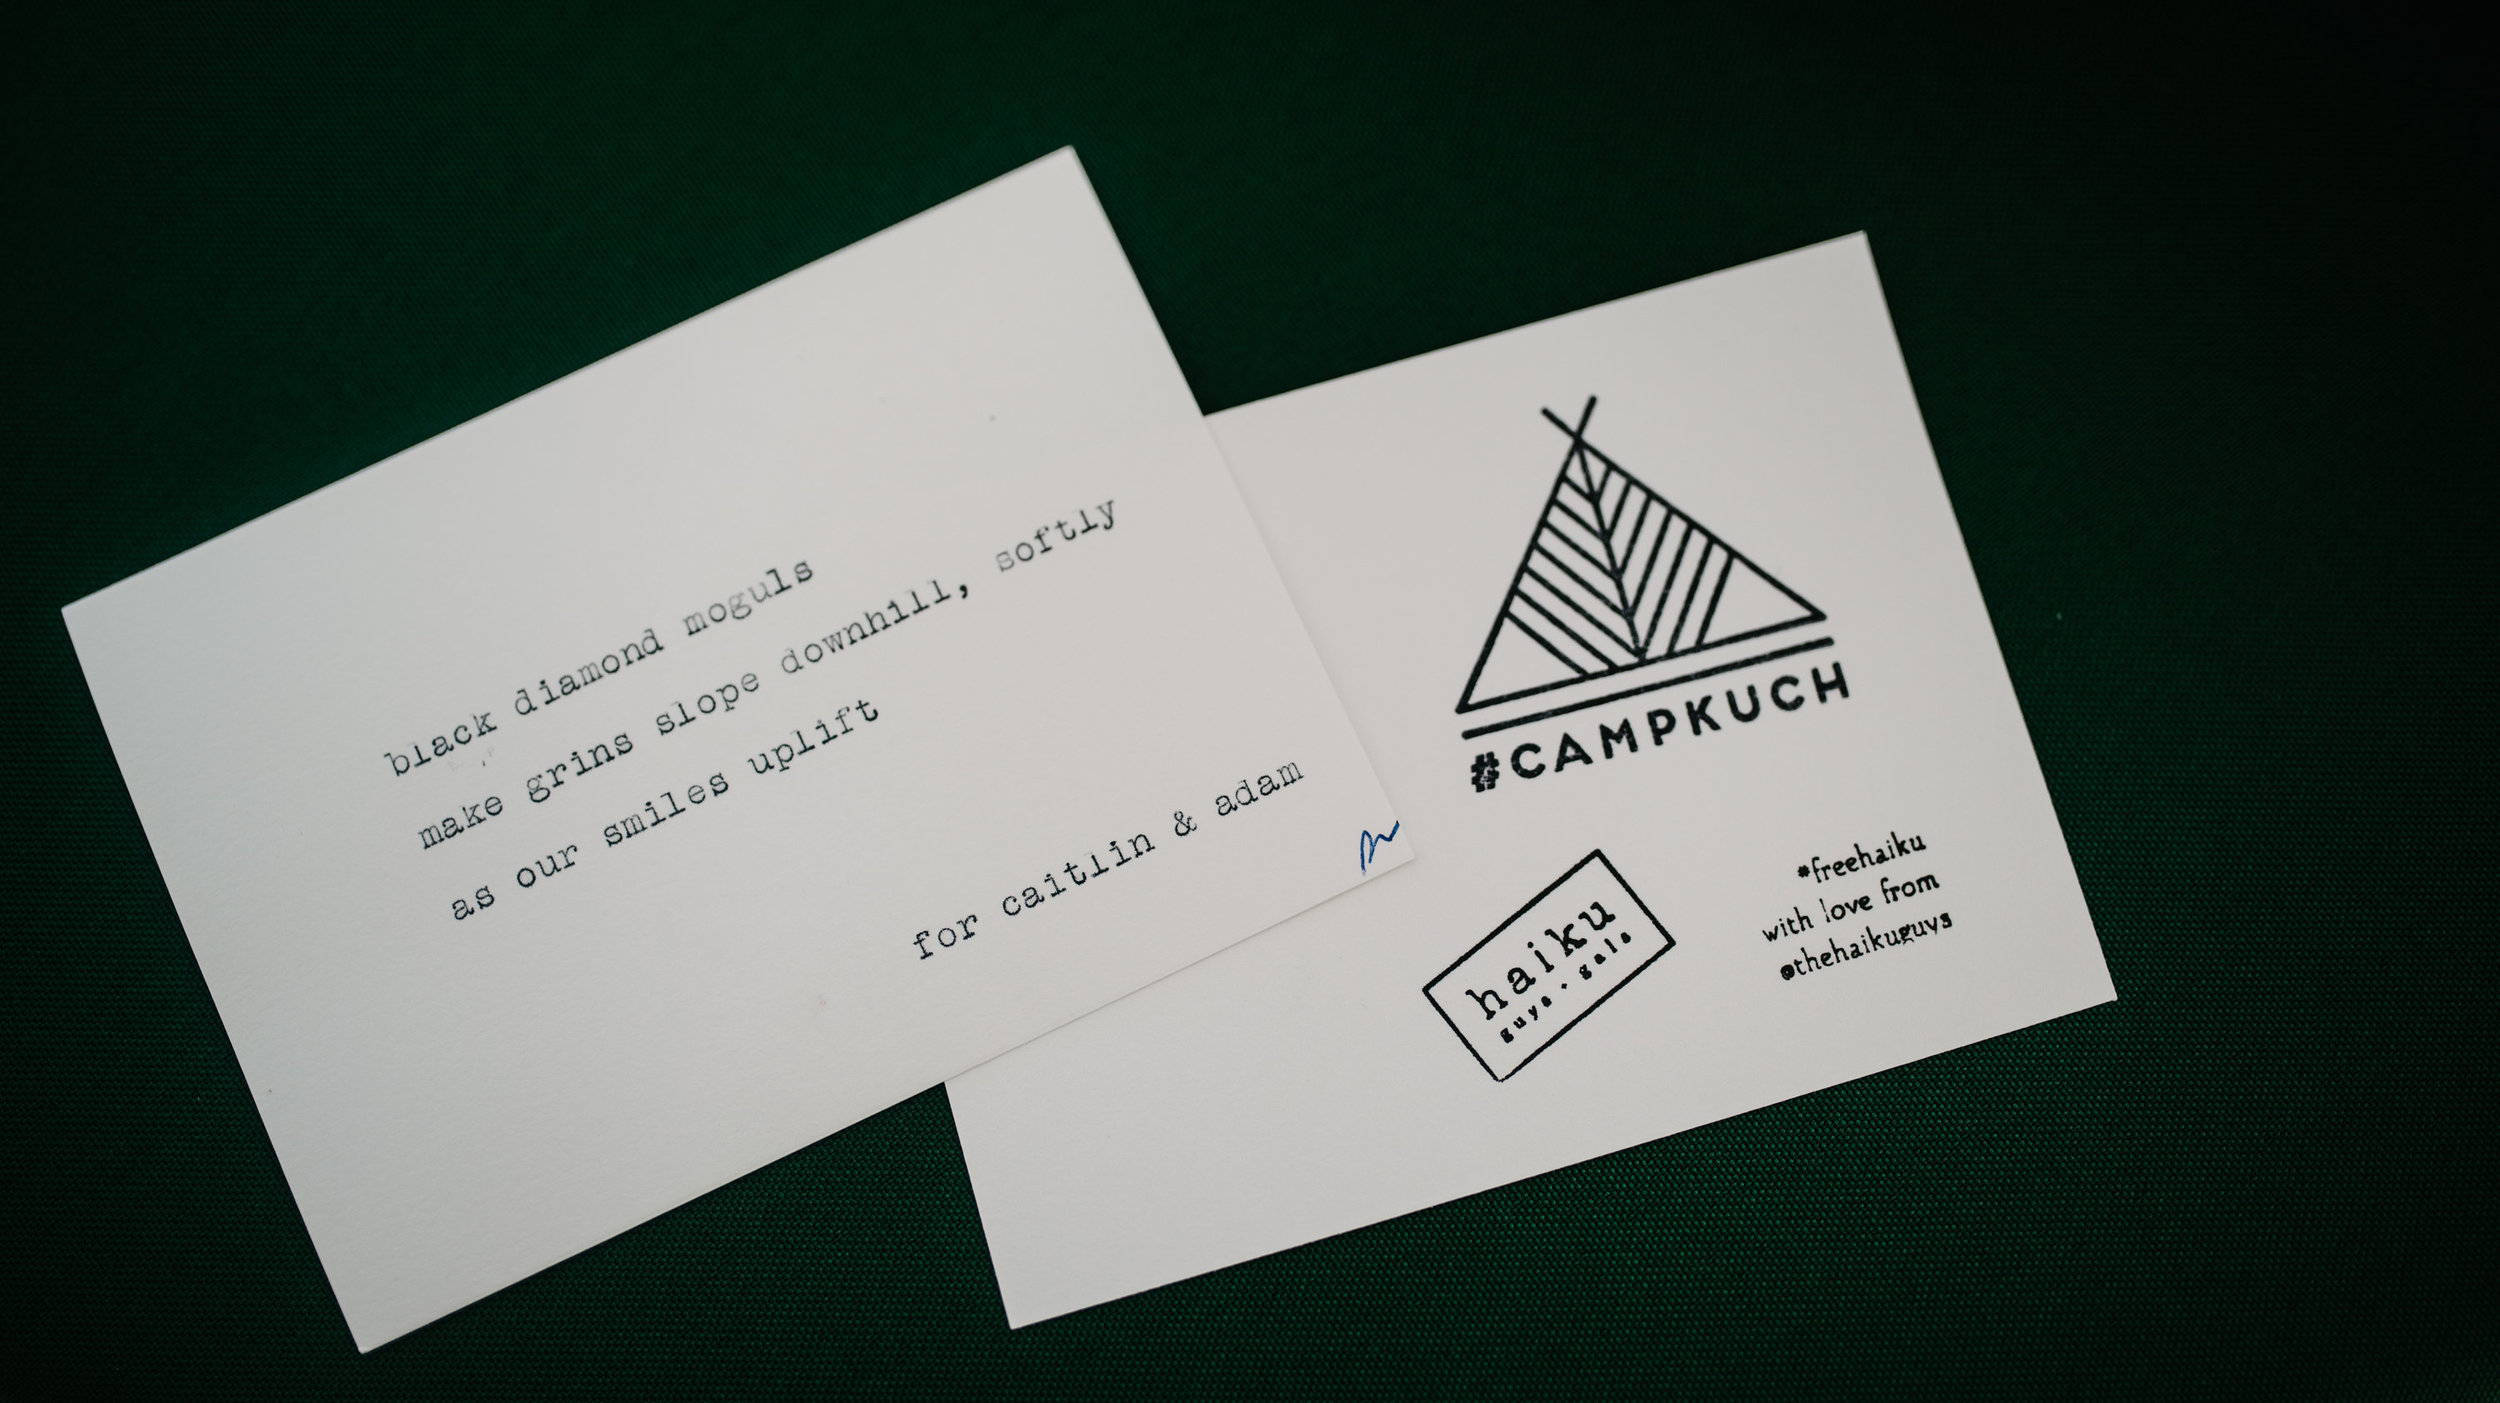 campkuch-4121.jpg